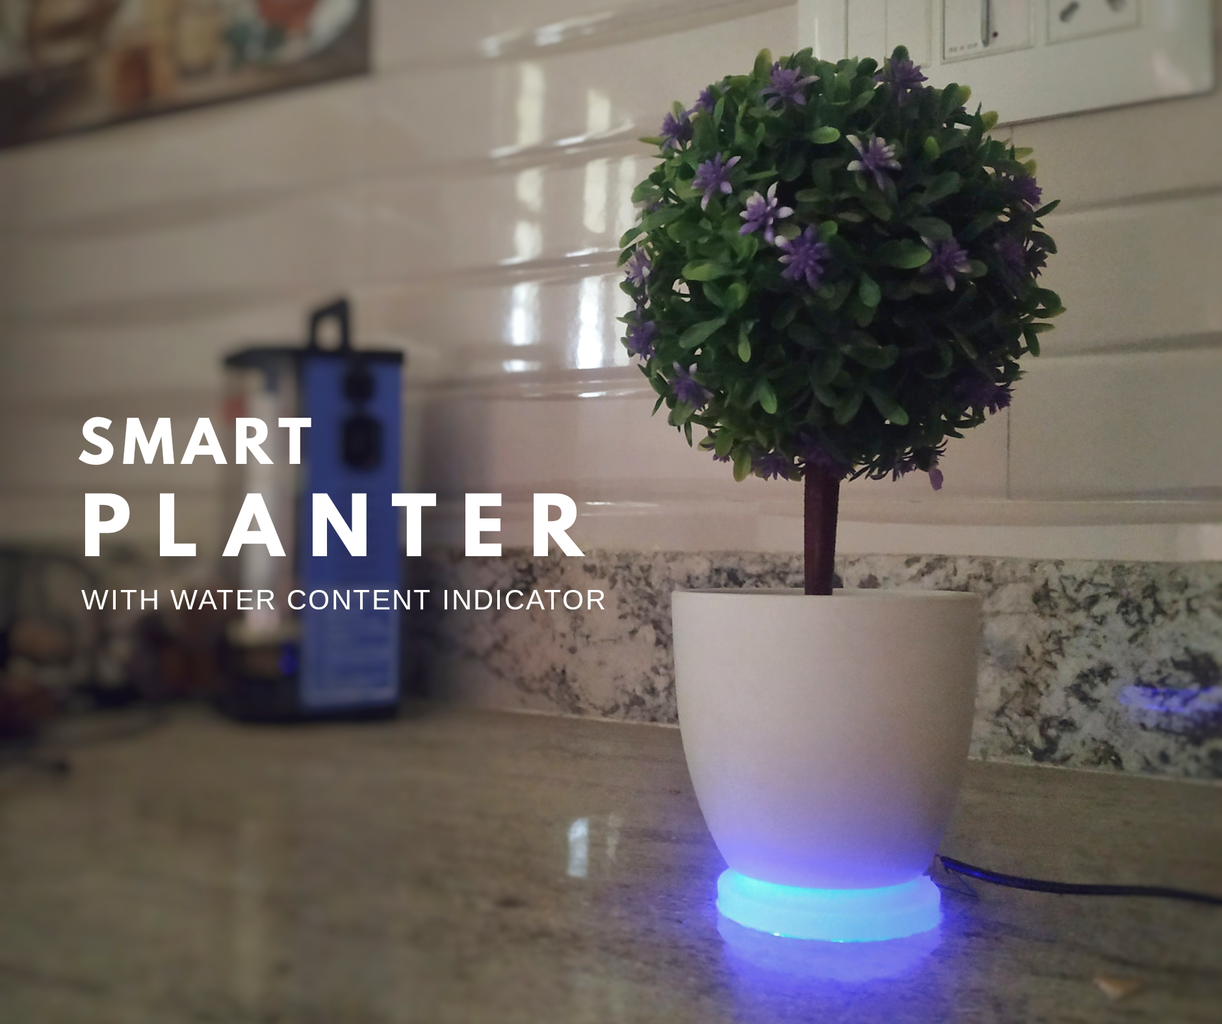 Smart Planter - Indicates Water Level